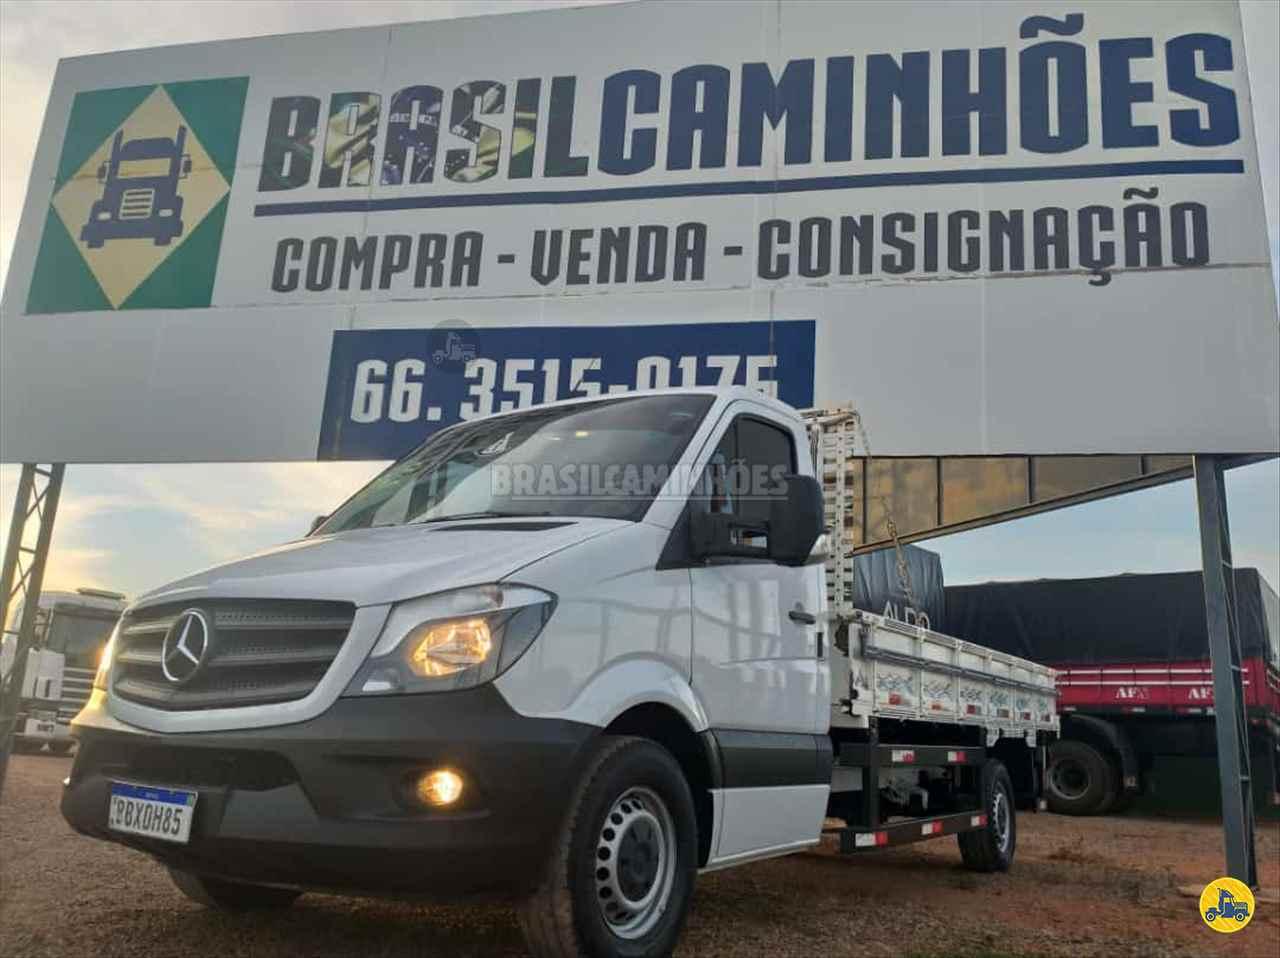 UTILITARIOS MERCEDES-BENZ Sprinter Chassi 313 Brasil Caminhões Sinop SINOP MATO GROSSO MT